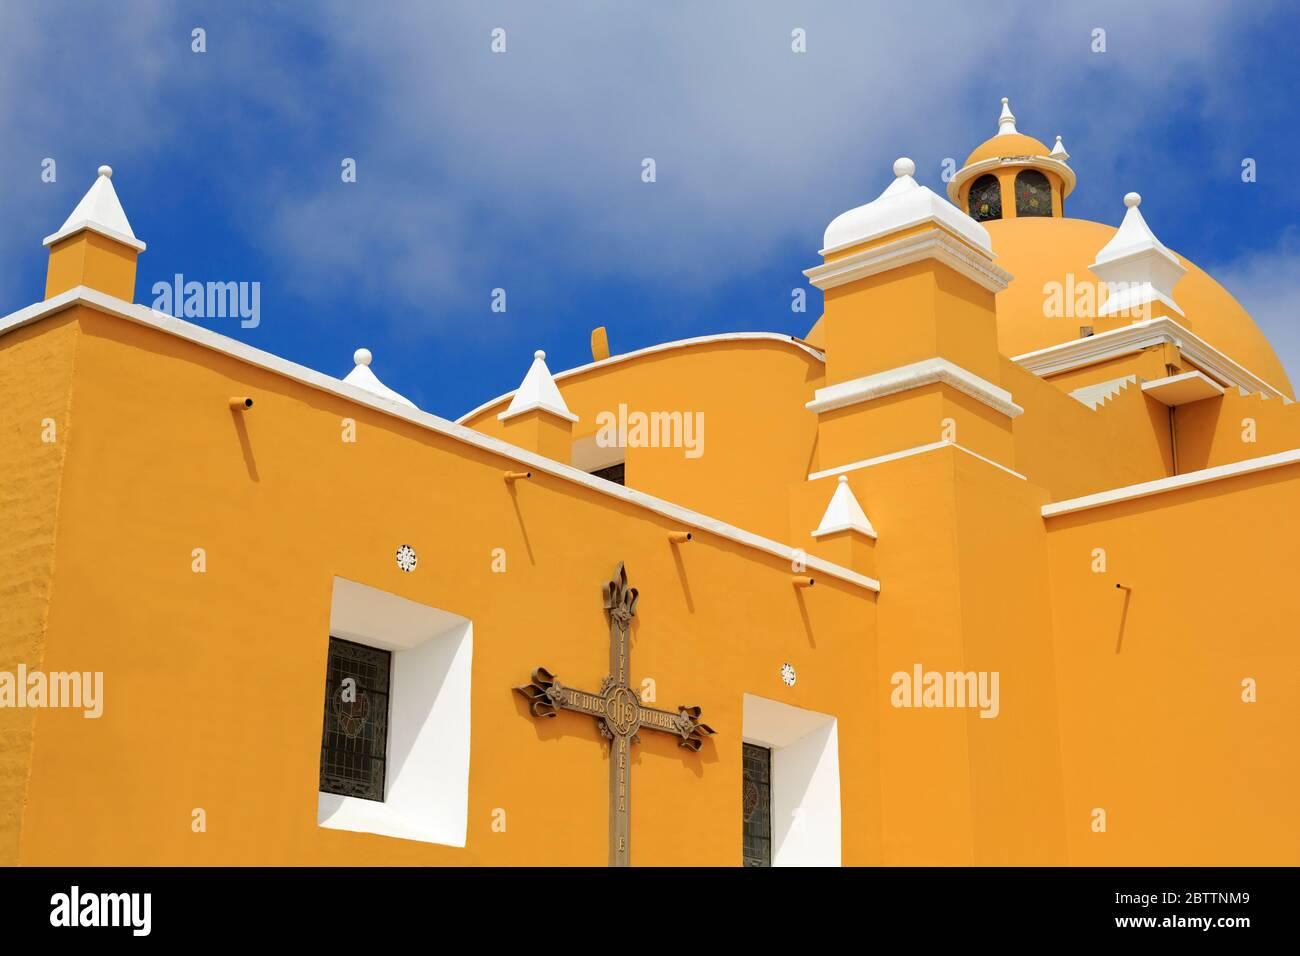 Cathedral Basilica, Plaza de Armas, Trujillo, Peru, South America Stock Photo